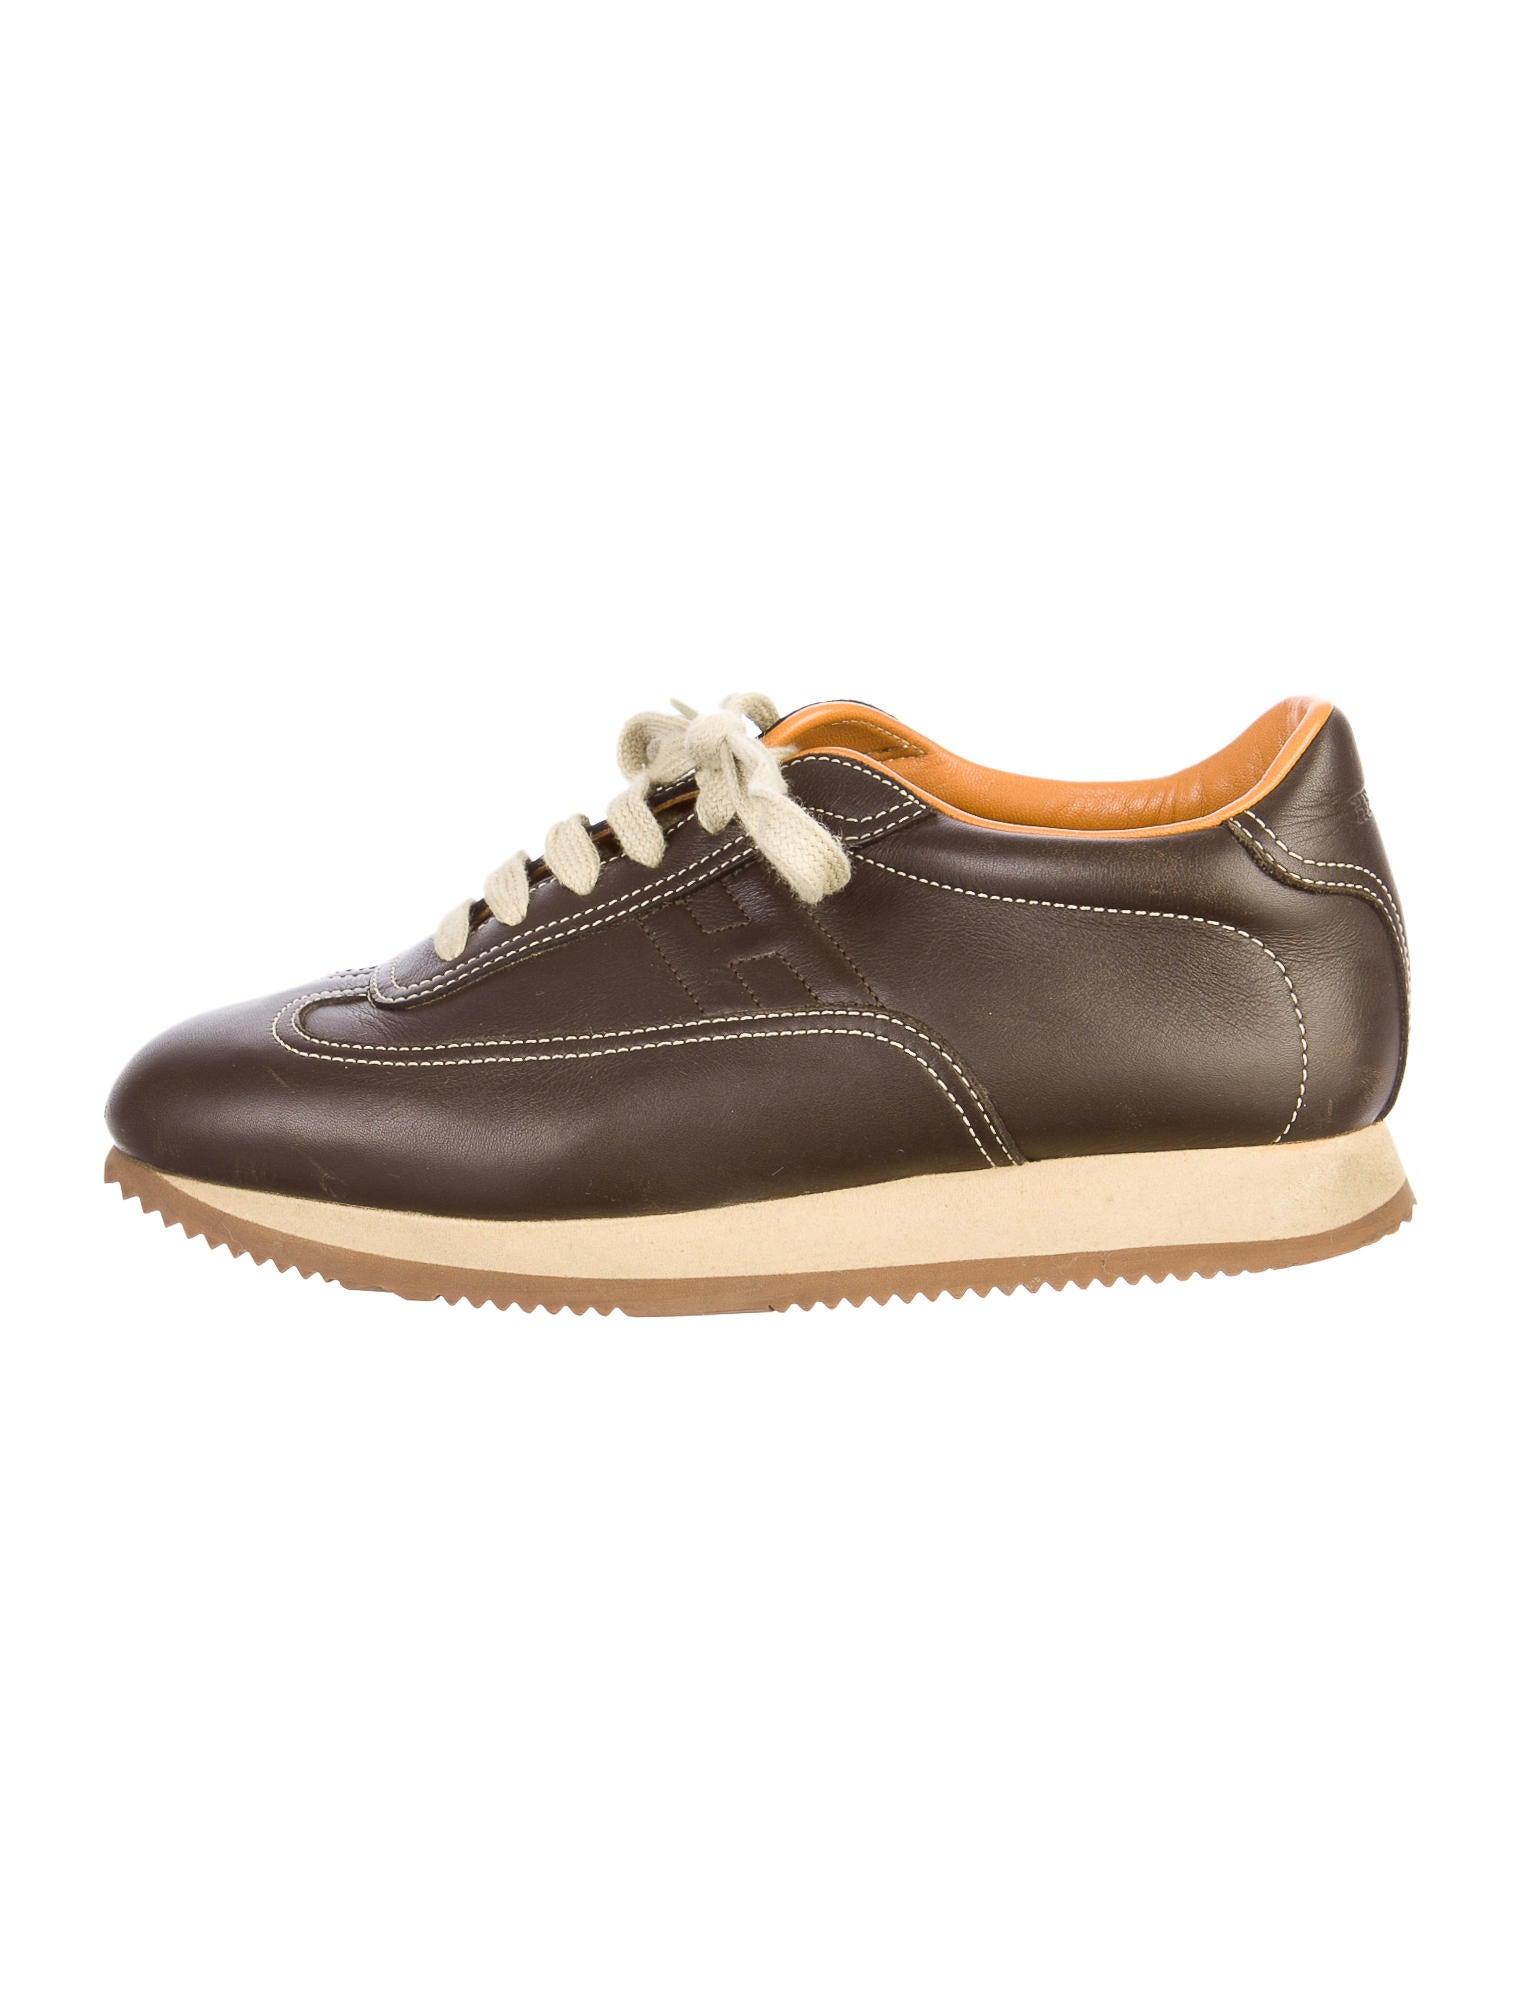 hermes women shoes - photo #34